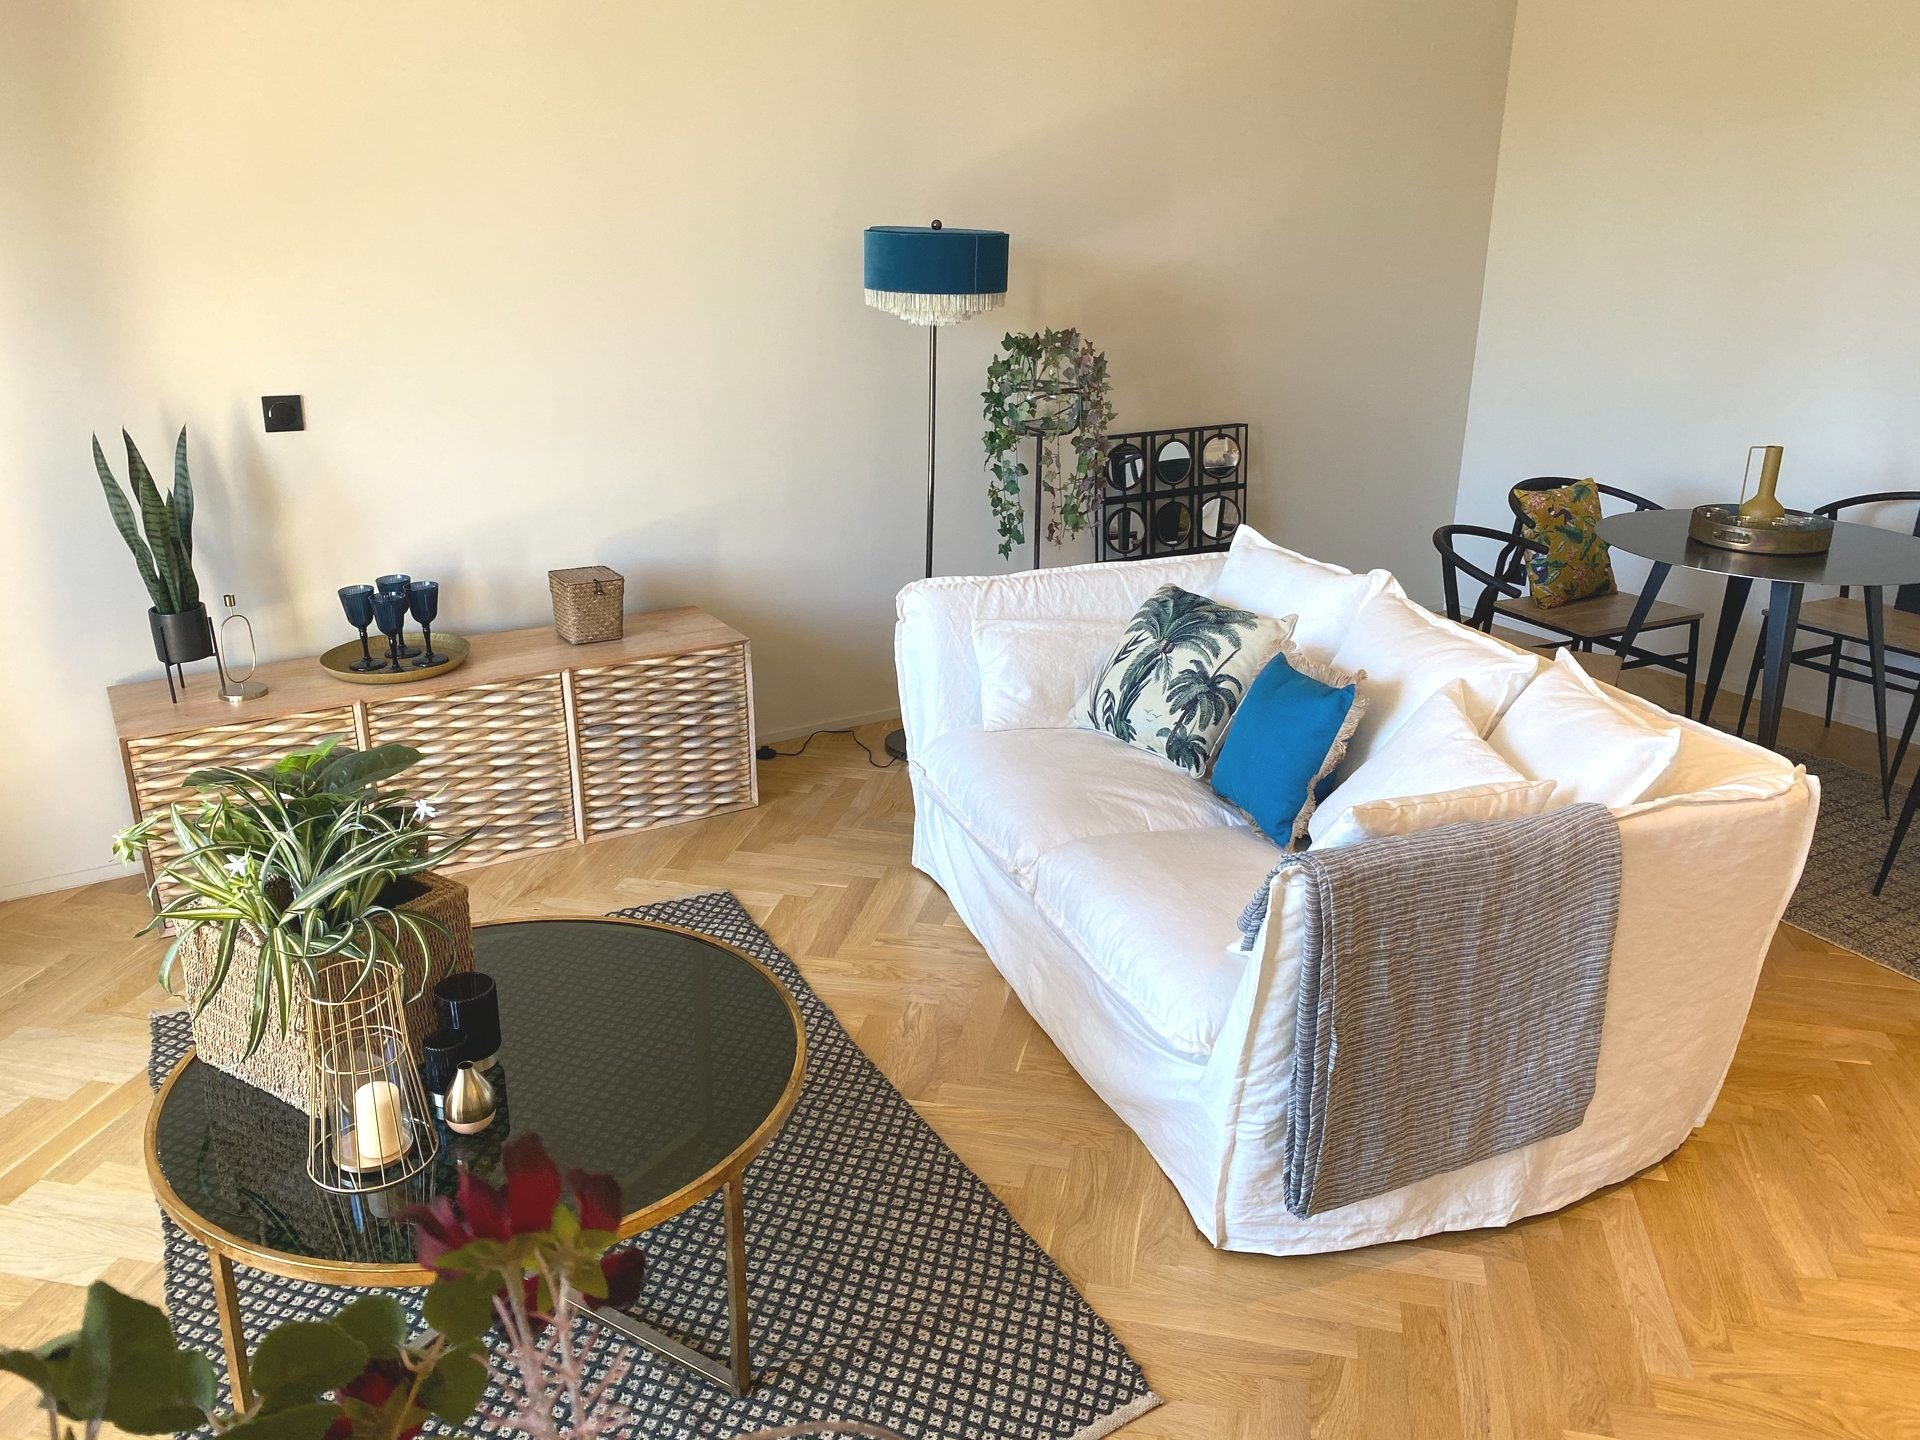 NICE GOLDEN SQUARE -  Stunning 1 bedroom